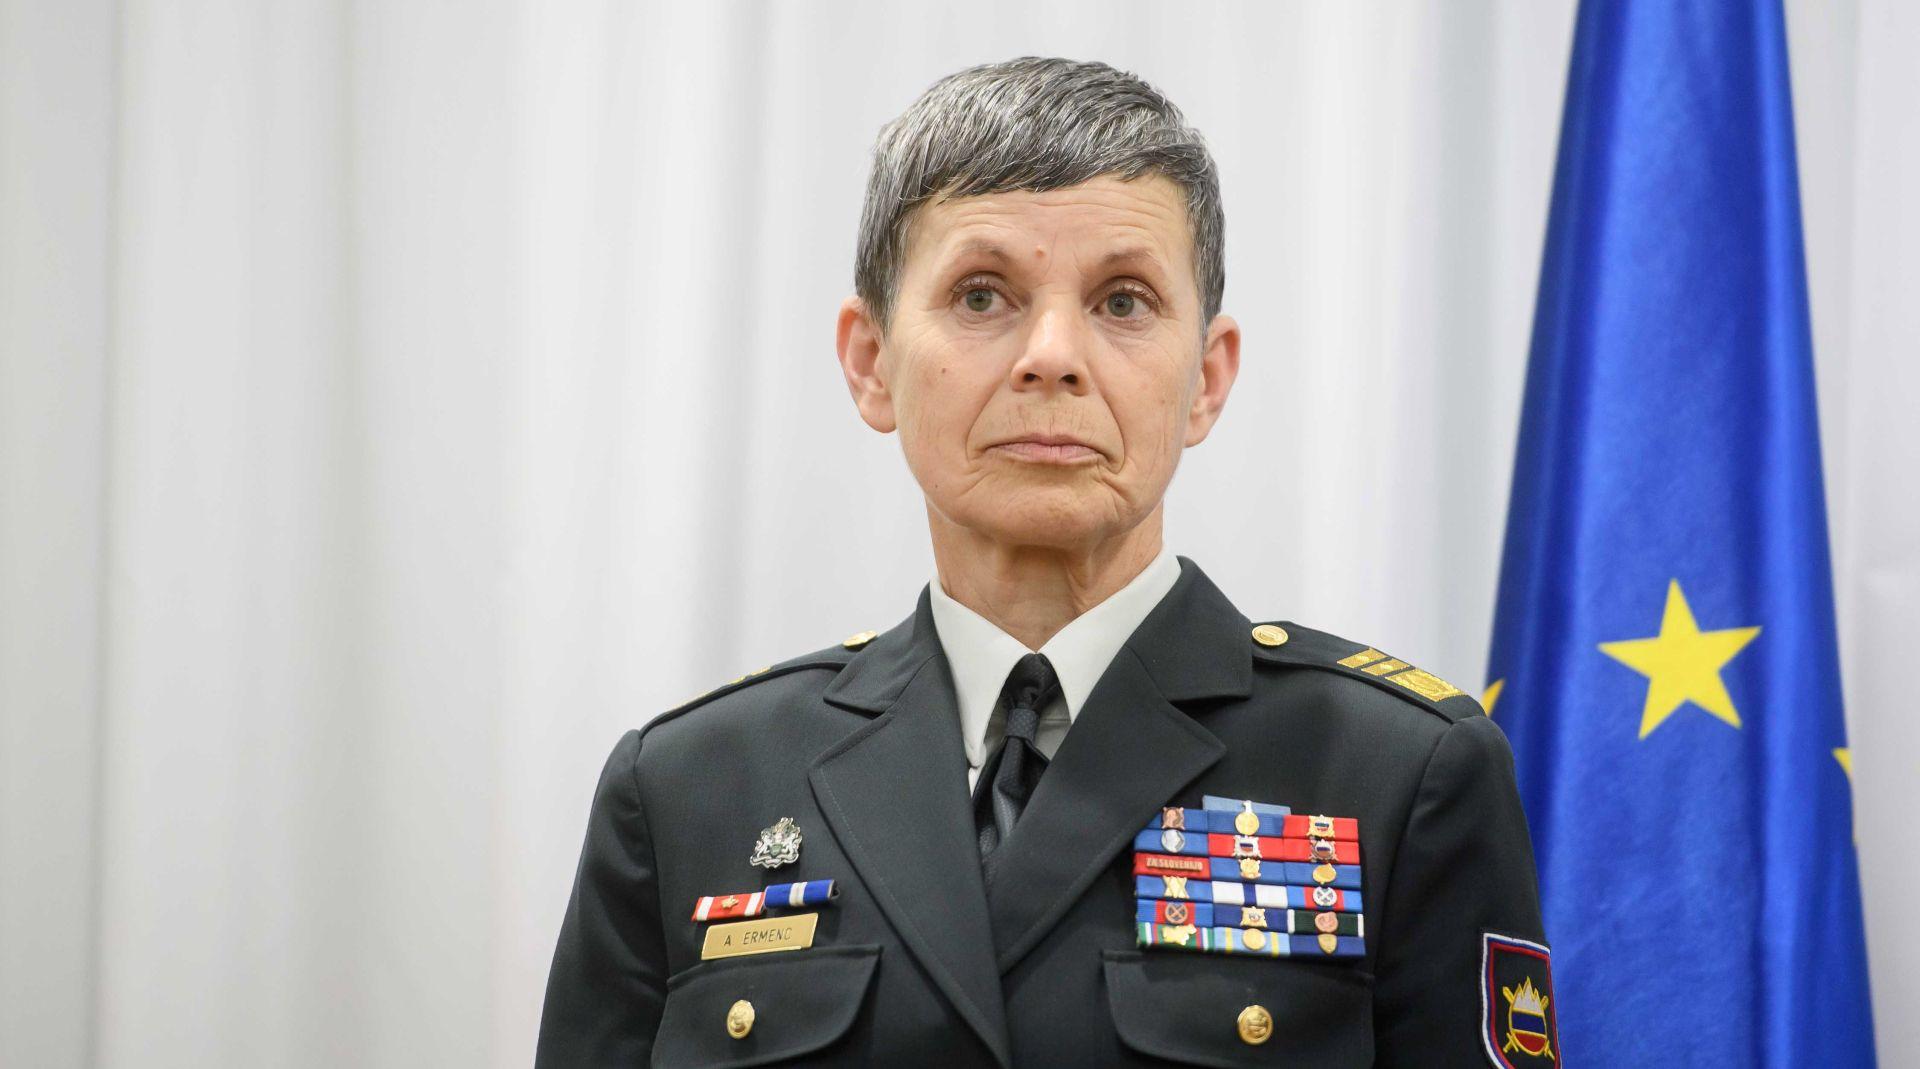 Nakon vojske i slovenska policija dobiva žensko zapovjedništvo